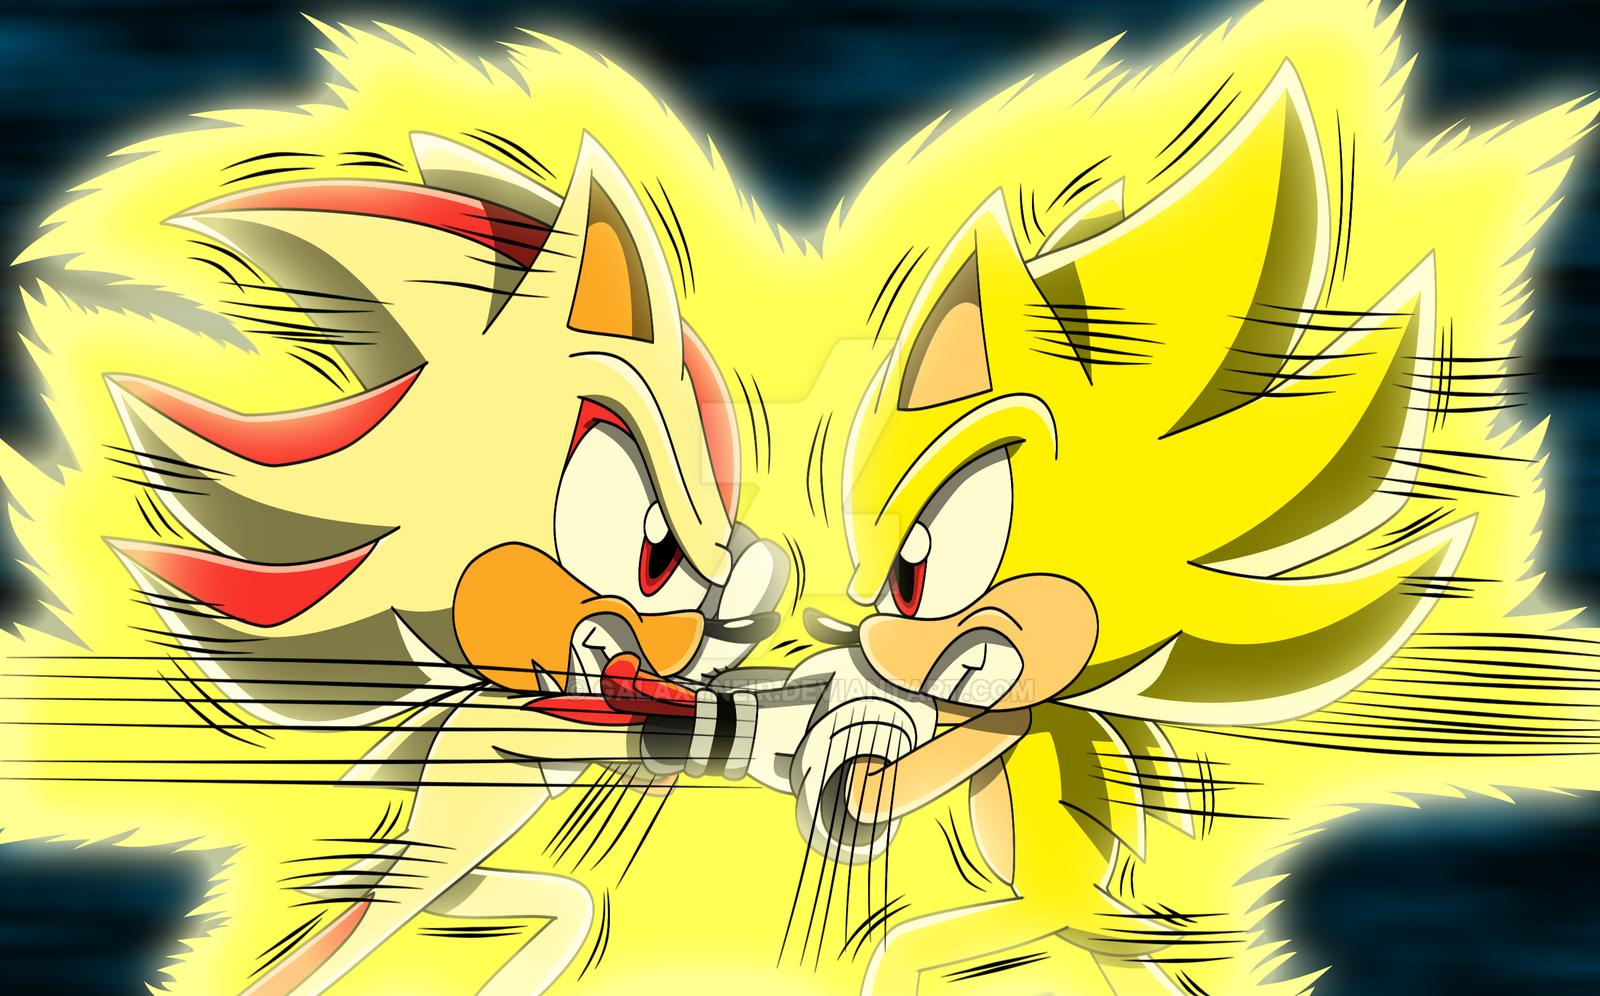 Sonic vs Shadow  ReRemake by Galaxyneir on DeviantArt